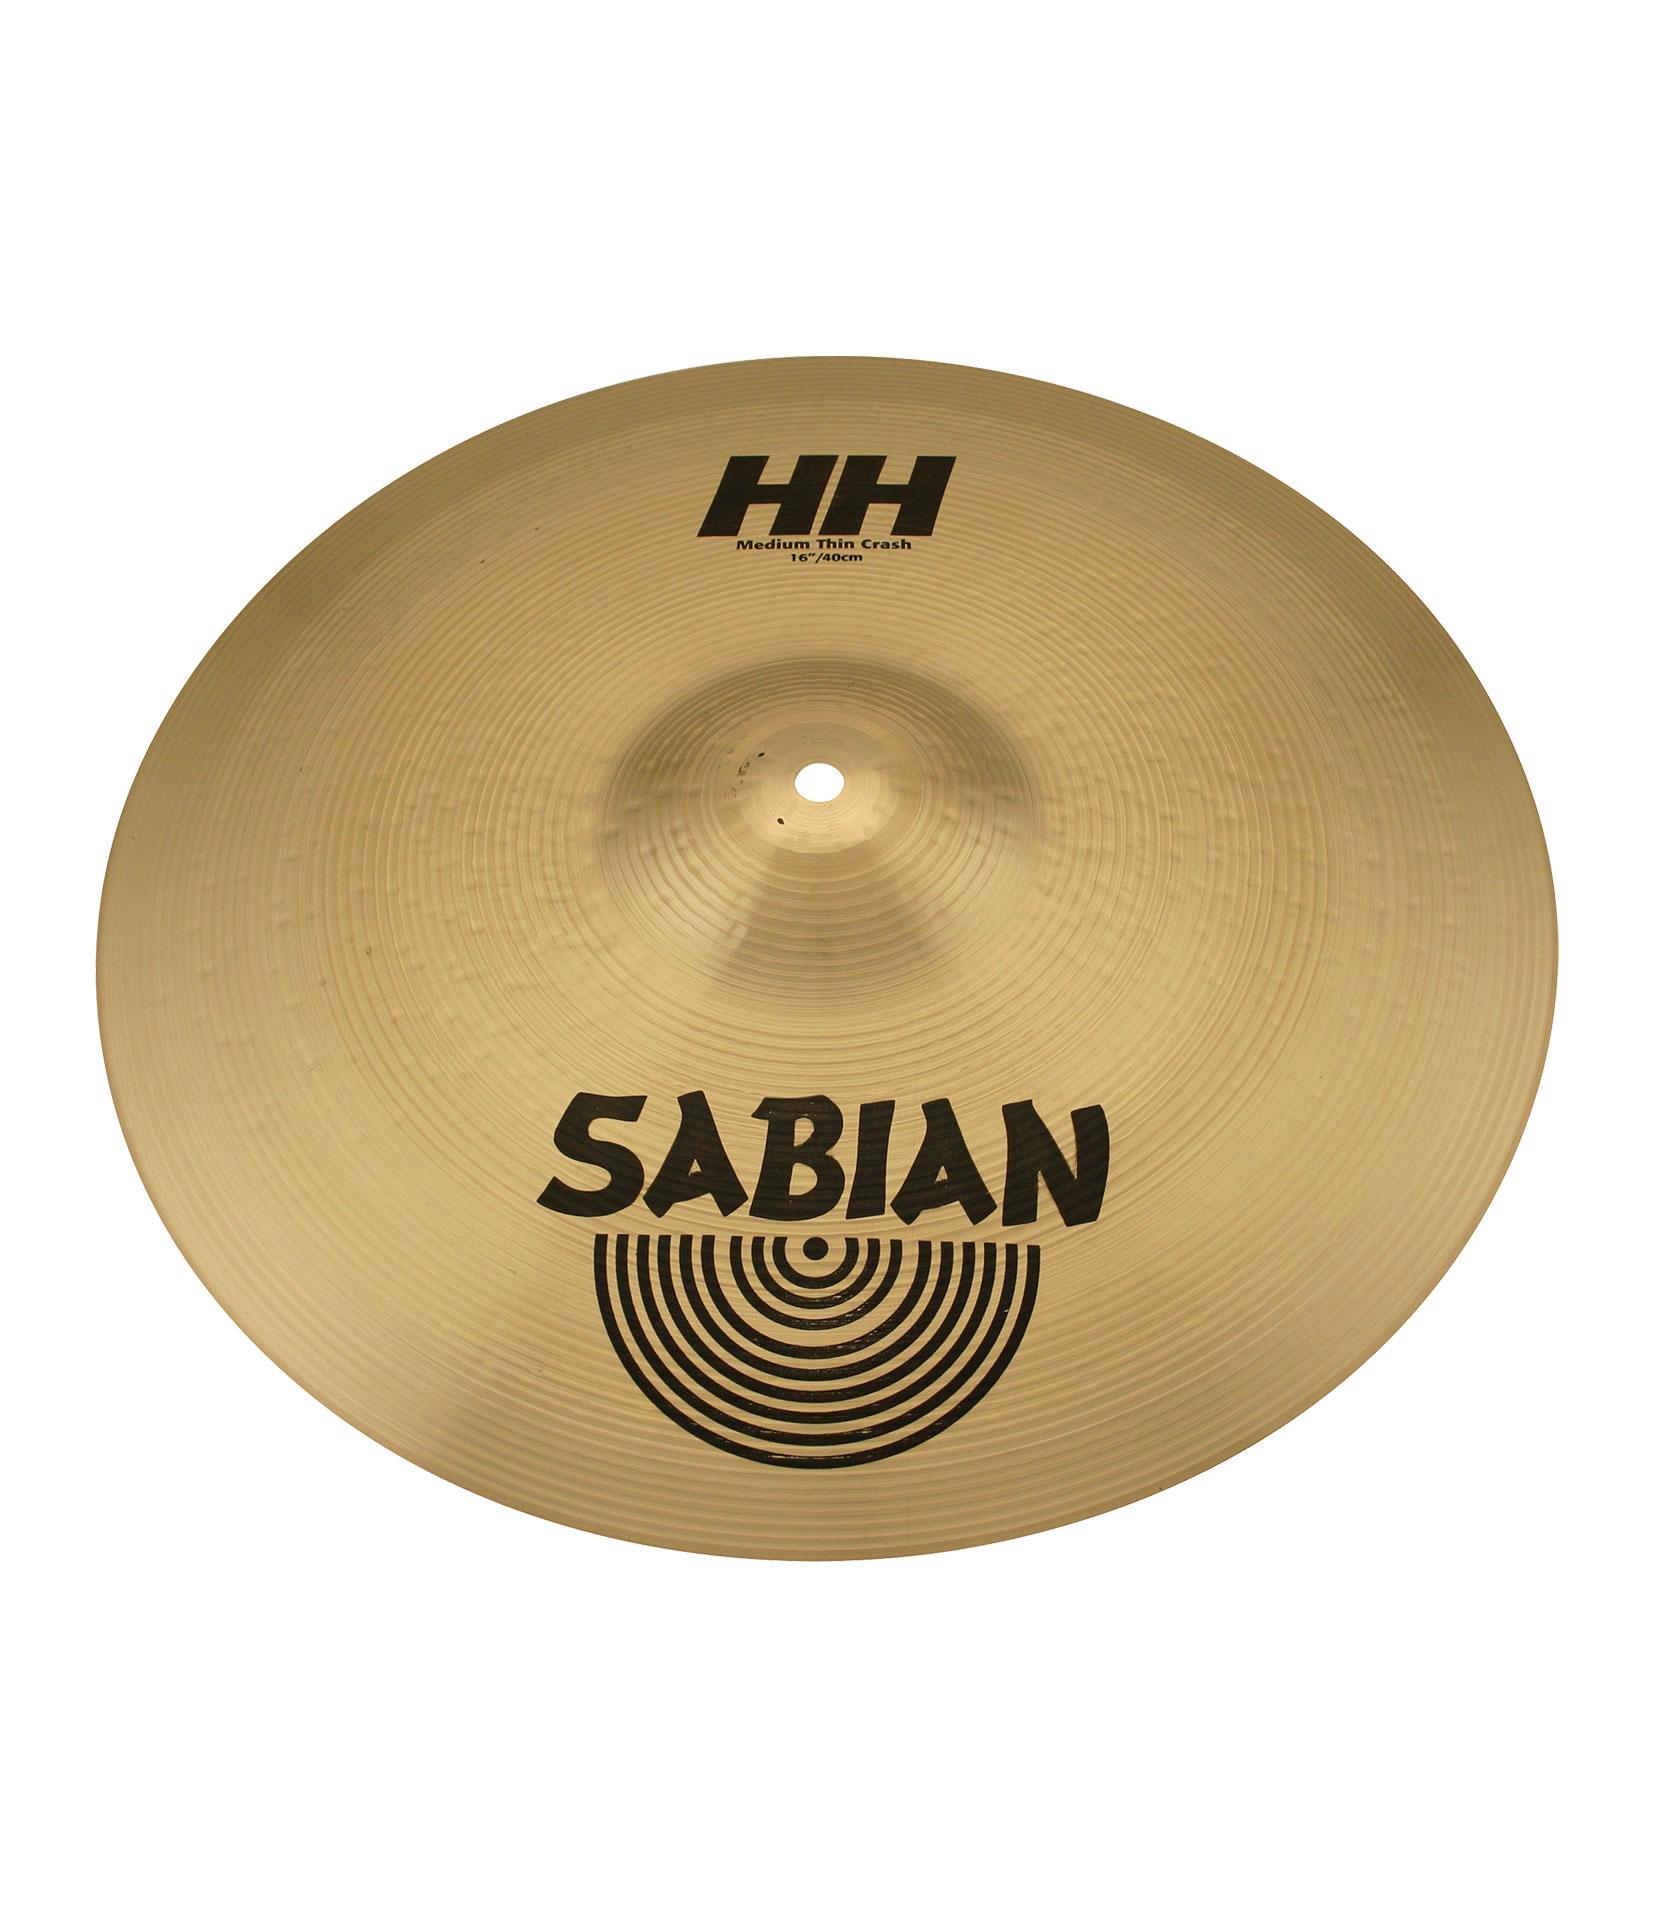 Buy Sabian - 16 HH Medium Thin Crash